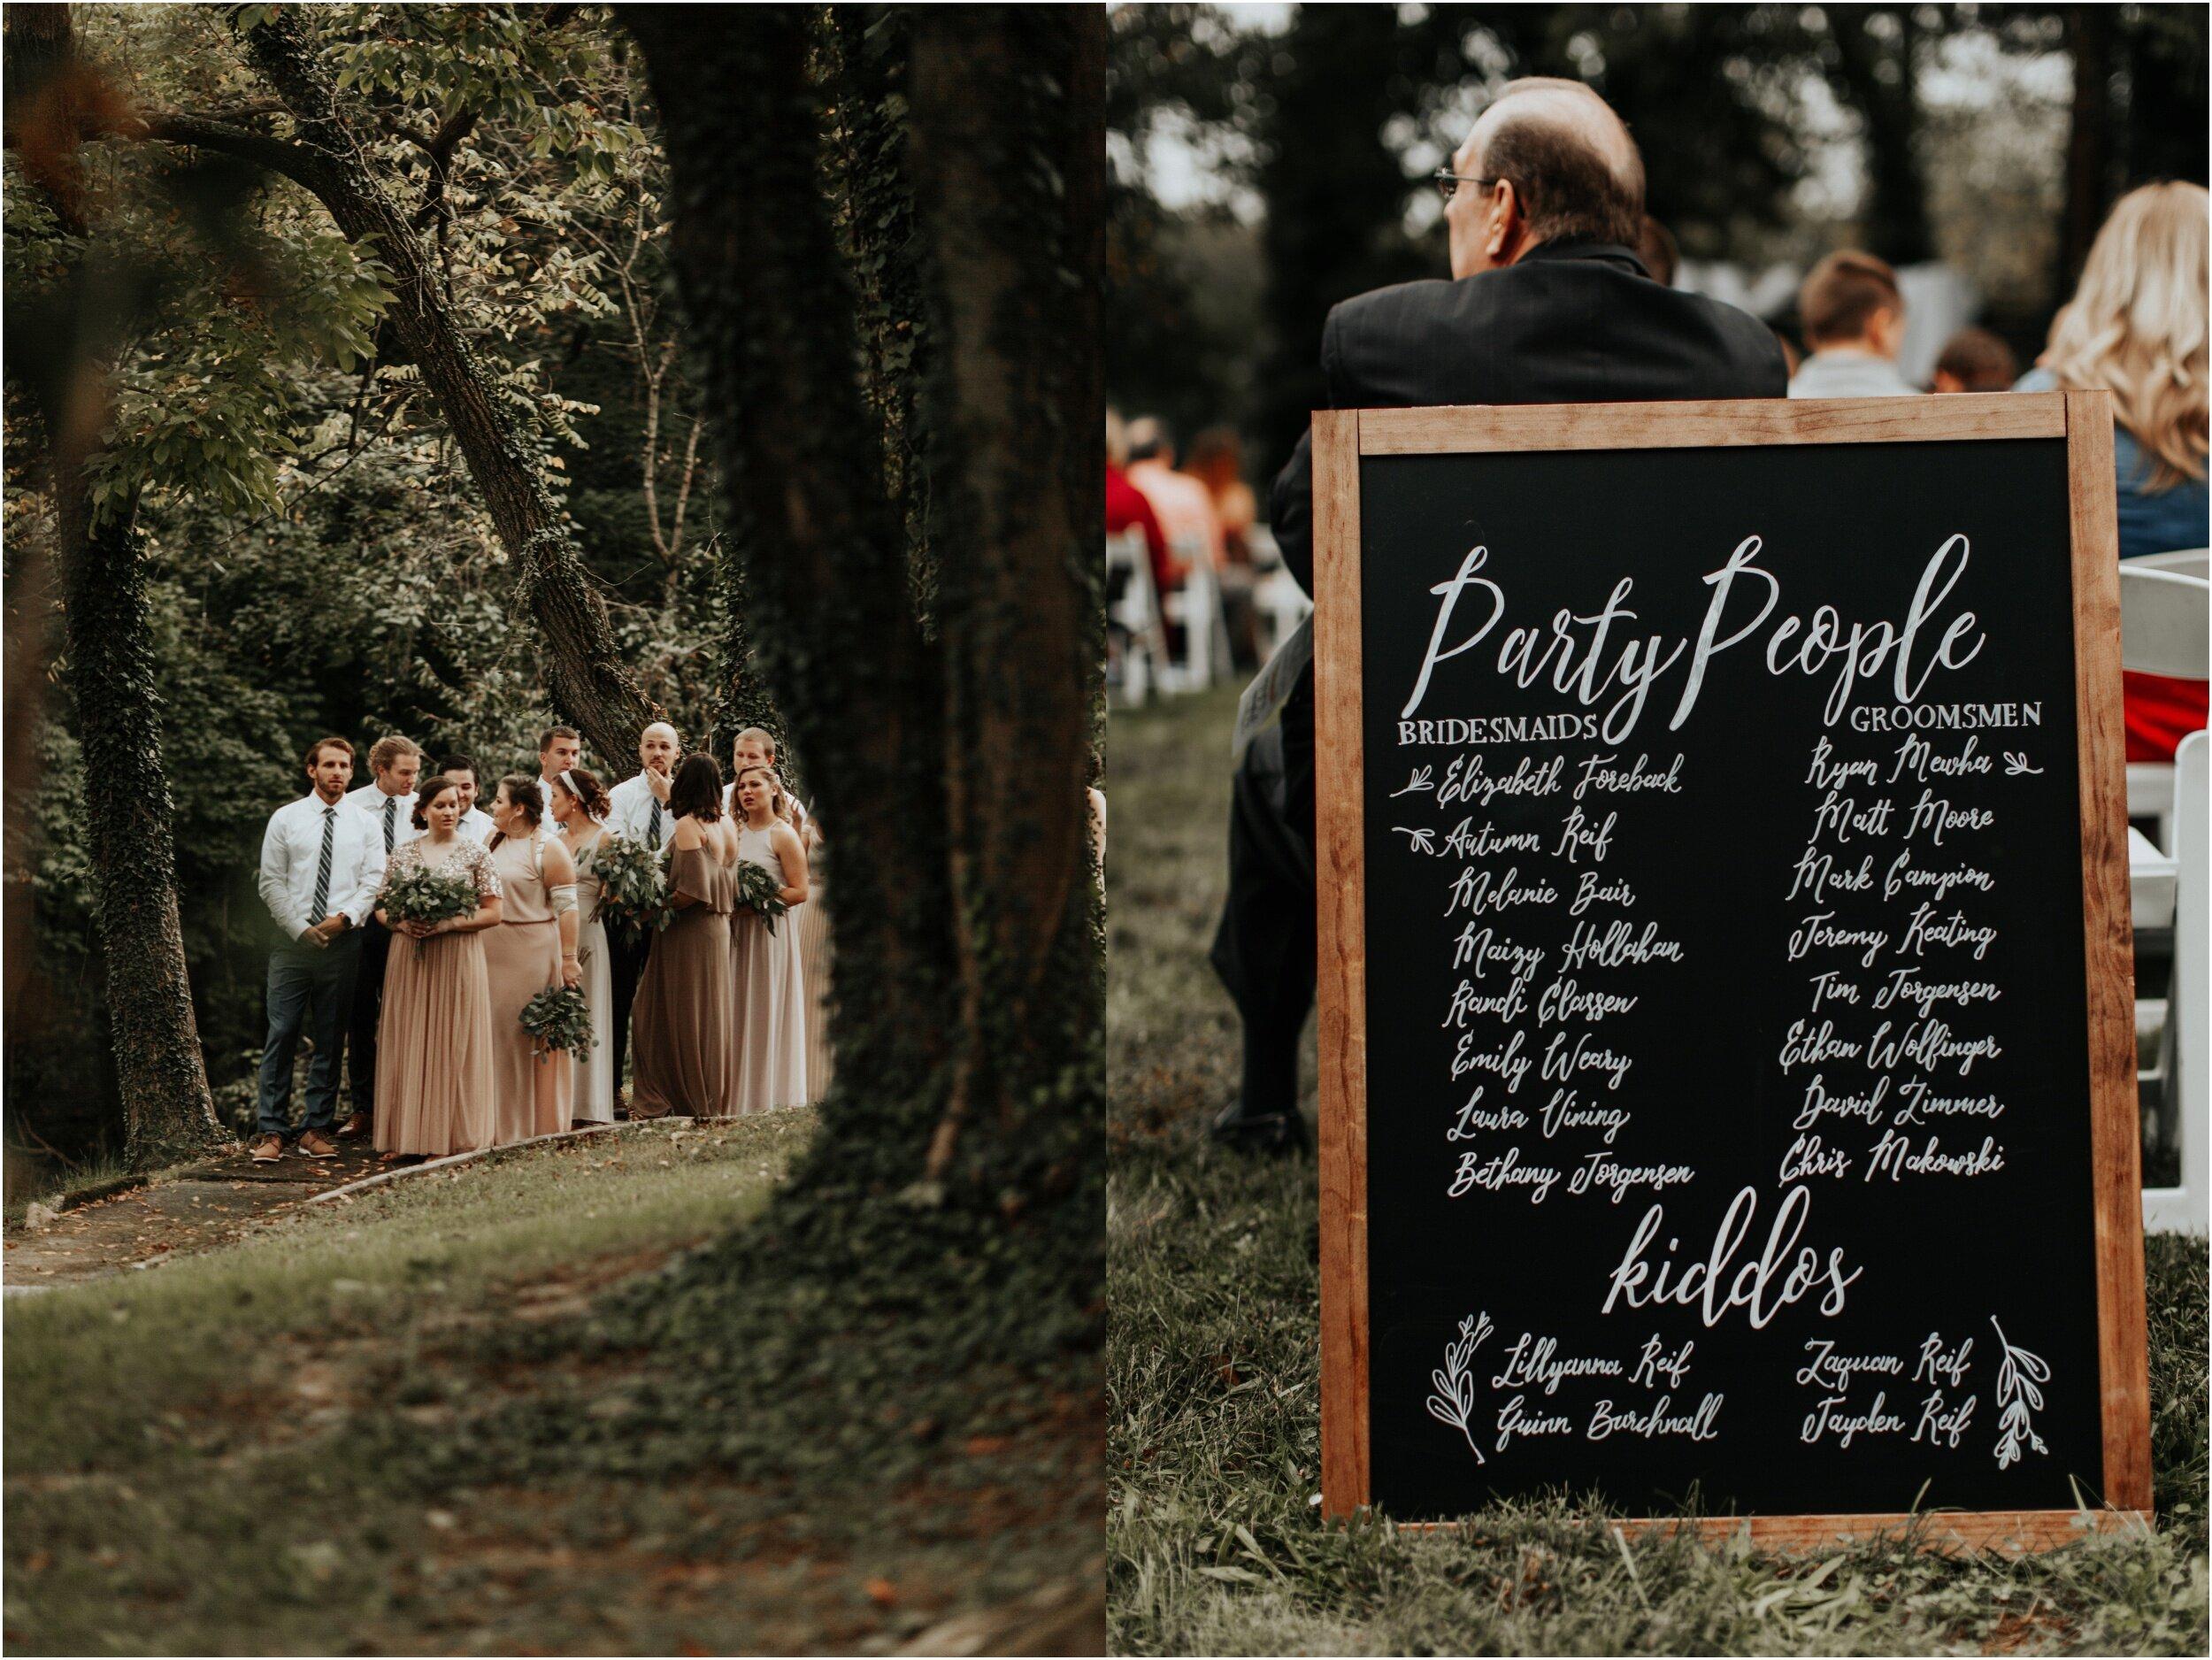 steph-and-jordan-cox-our-wedding-historic-shady-lane-compass-wedding-collective-hazel-lining-photography-destination-elopement-wedding-engagement-photography_0054.jpg